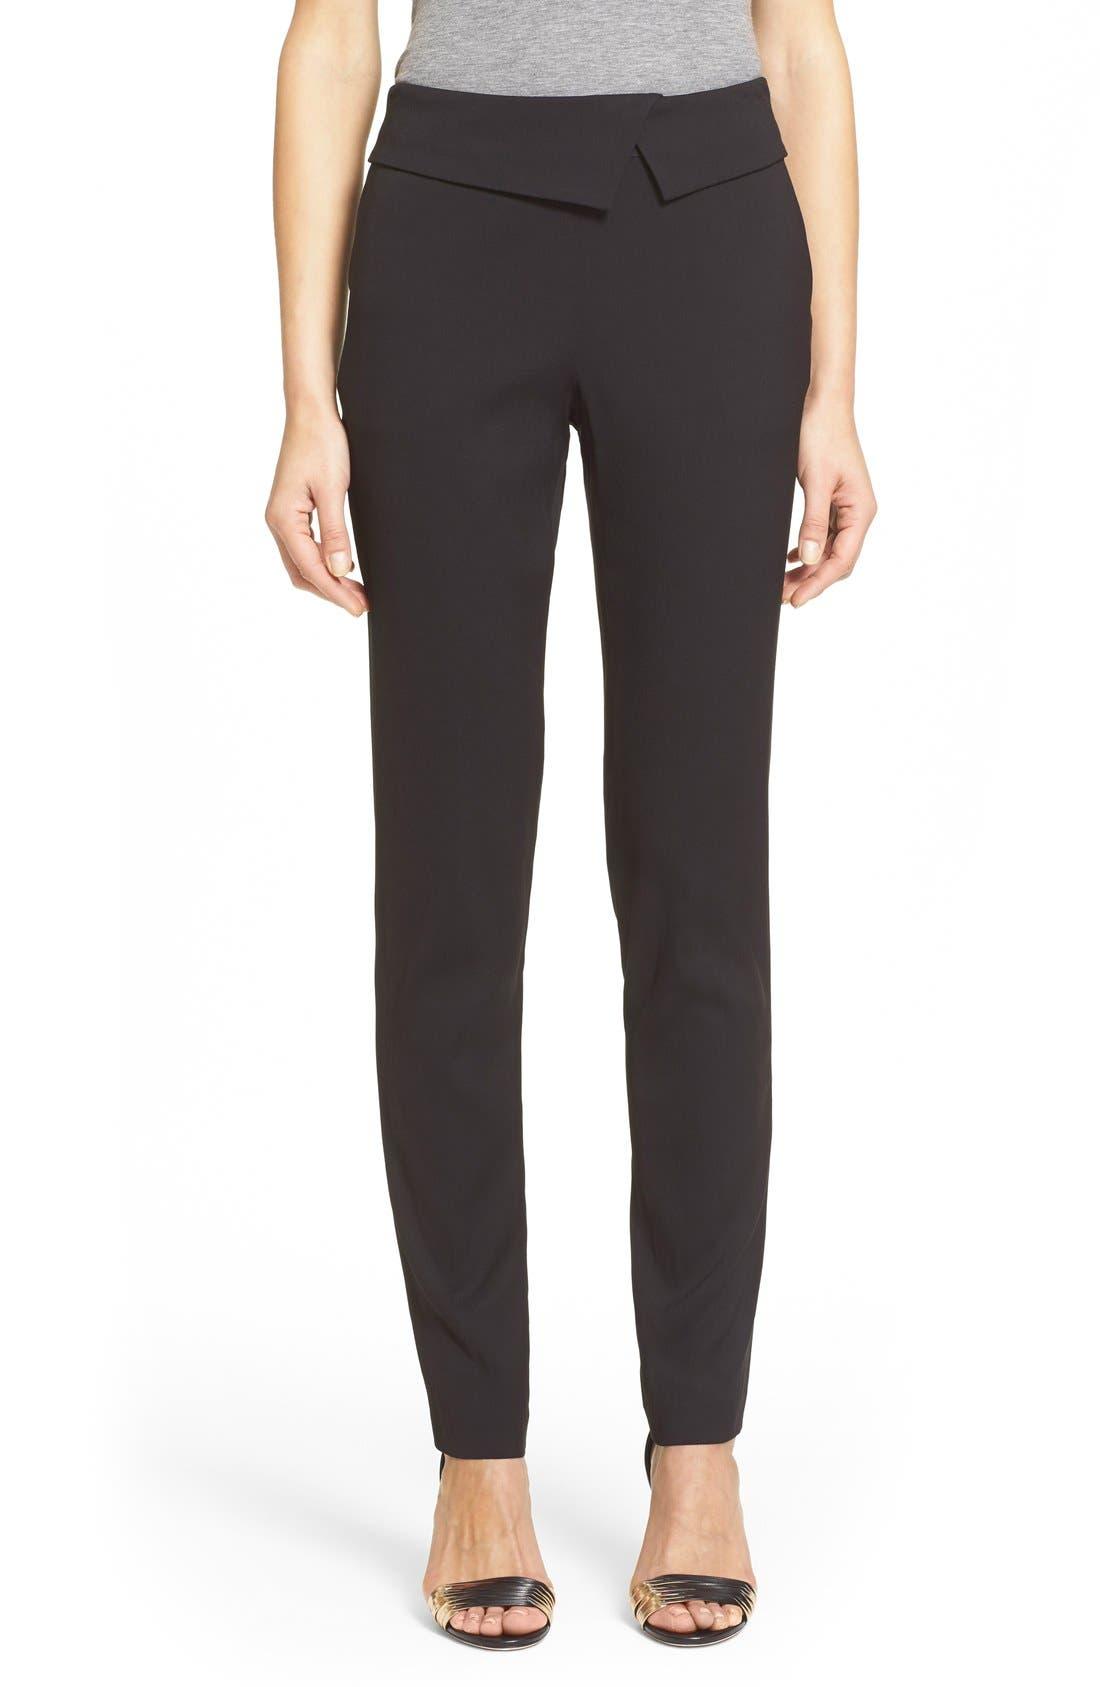 'Delray' Foldover Trousers,                         Main,                         color,